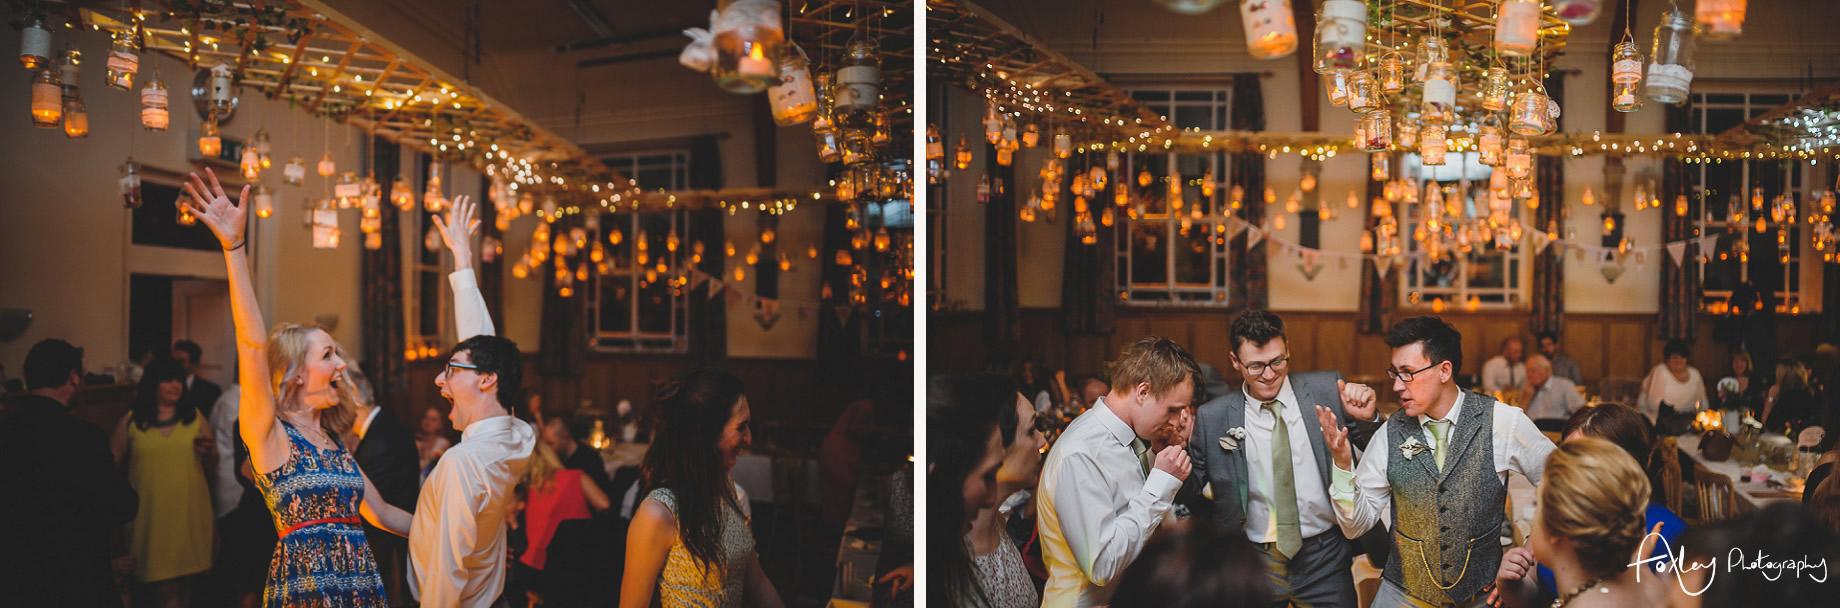 Mel-and-Lewis-Wedding-at-Barley-Village-Hall-196